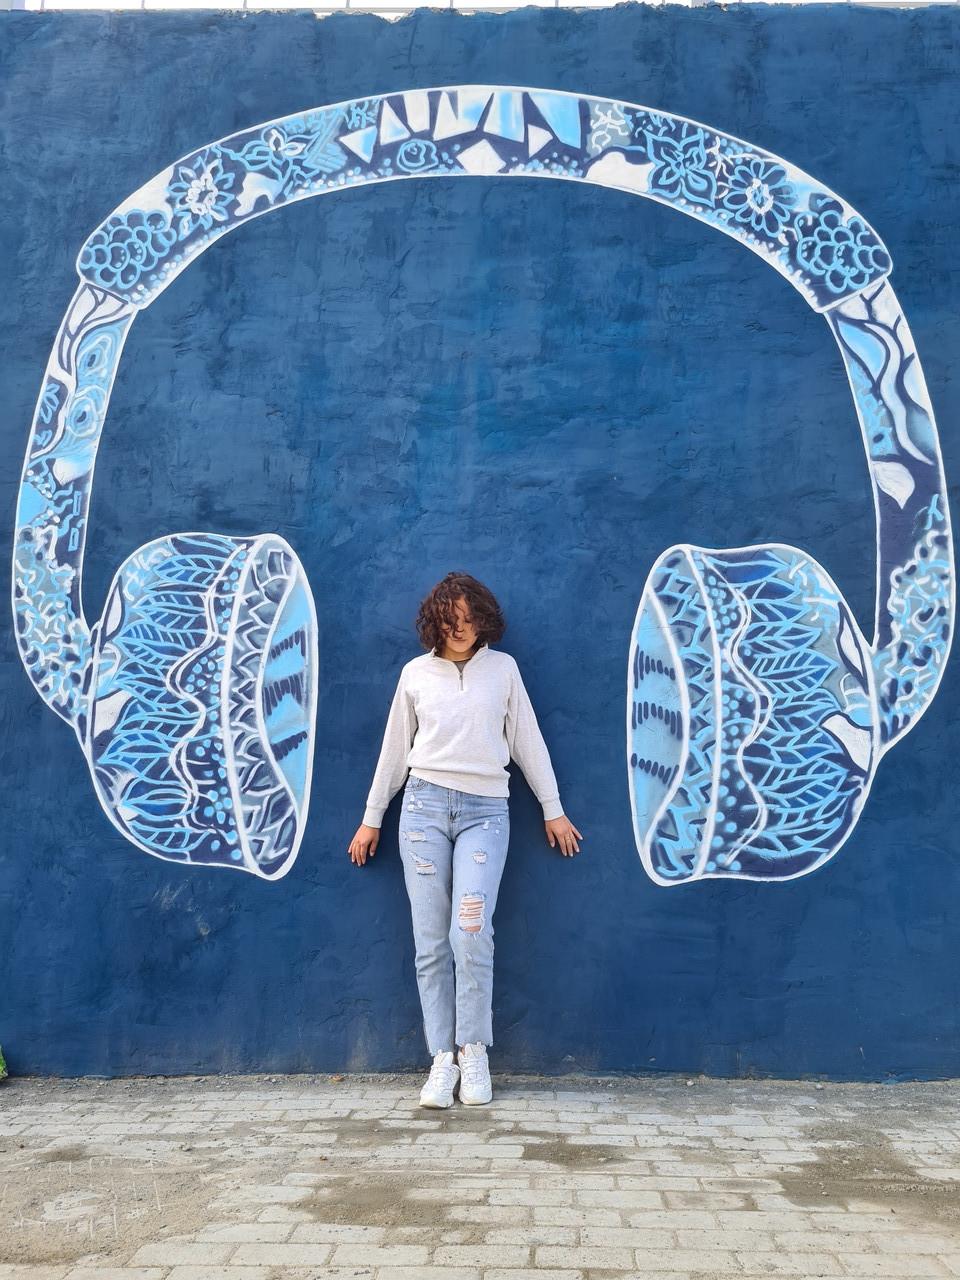 Мурал Роспись стен - фото 2